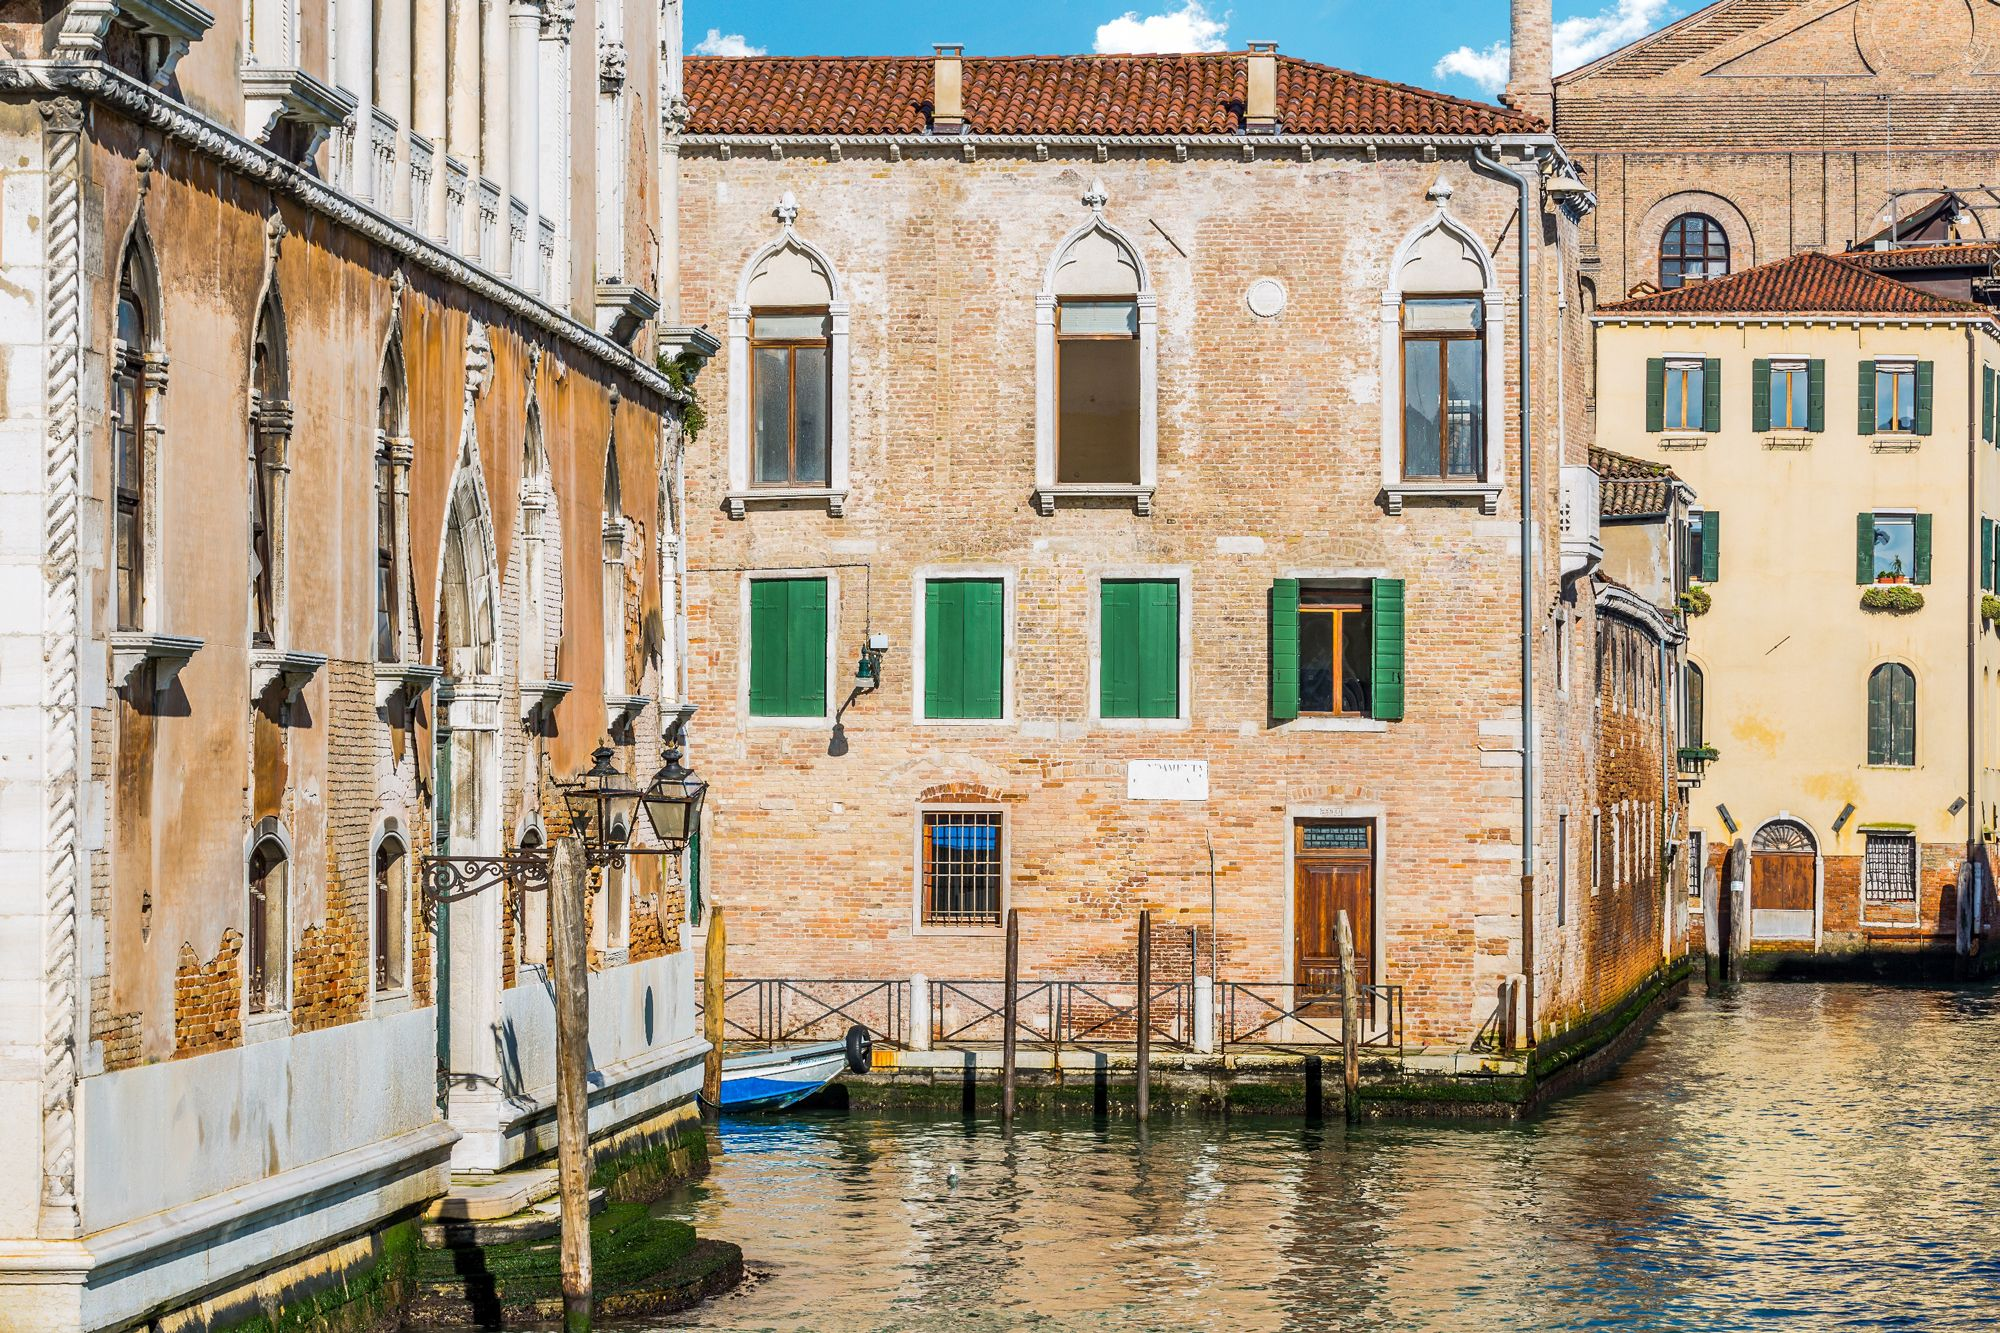 venice buildings - Google Search | Venice Reference Board ...